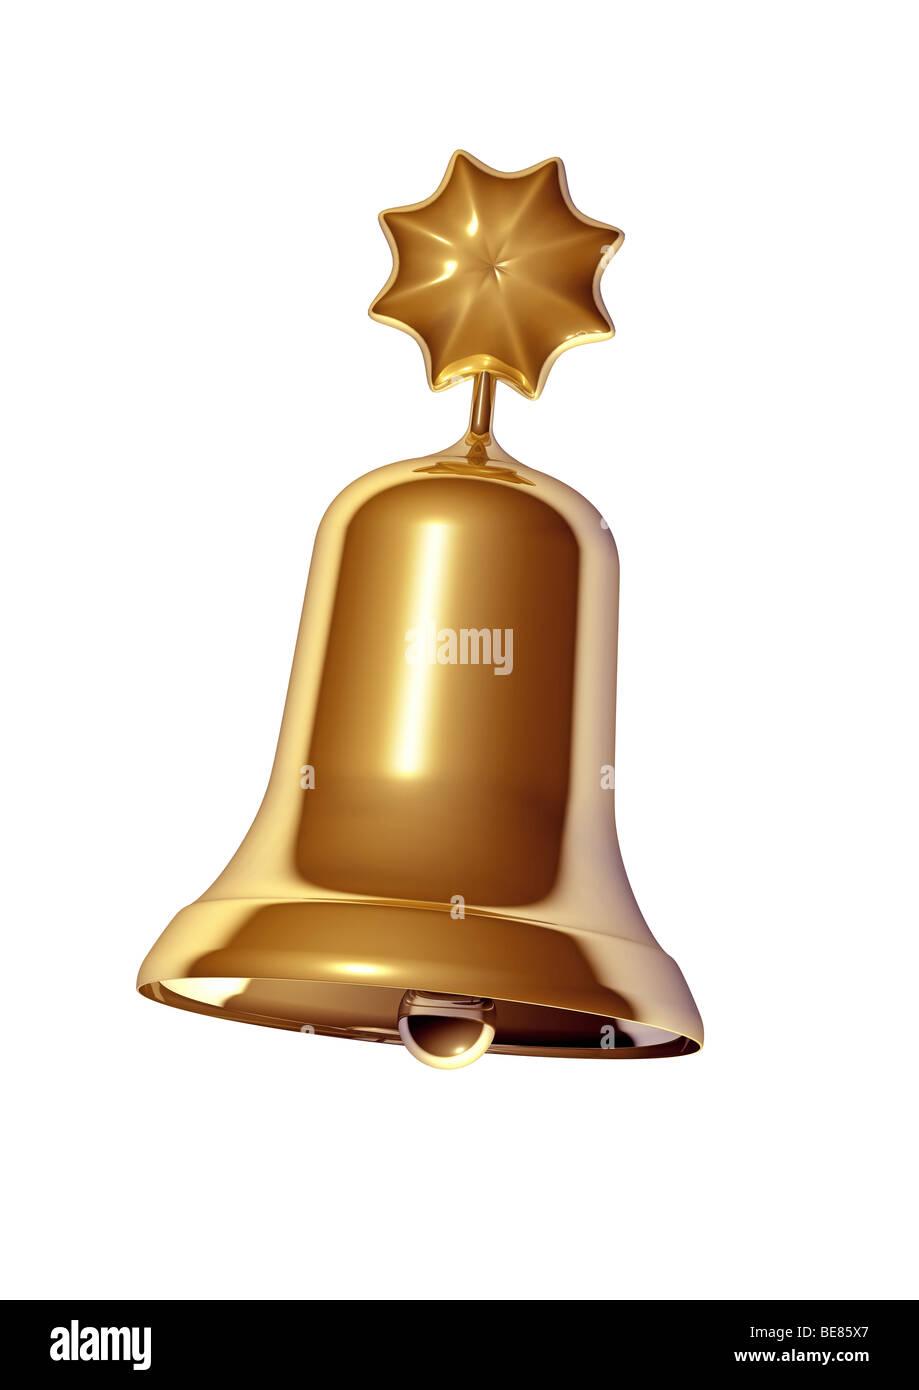 Golden Christmas Bell on White Background - Stock Image